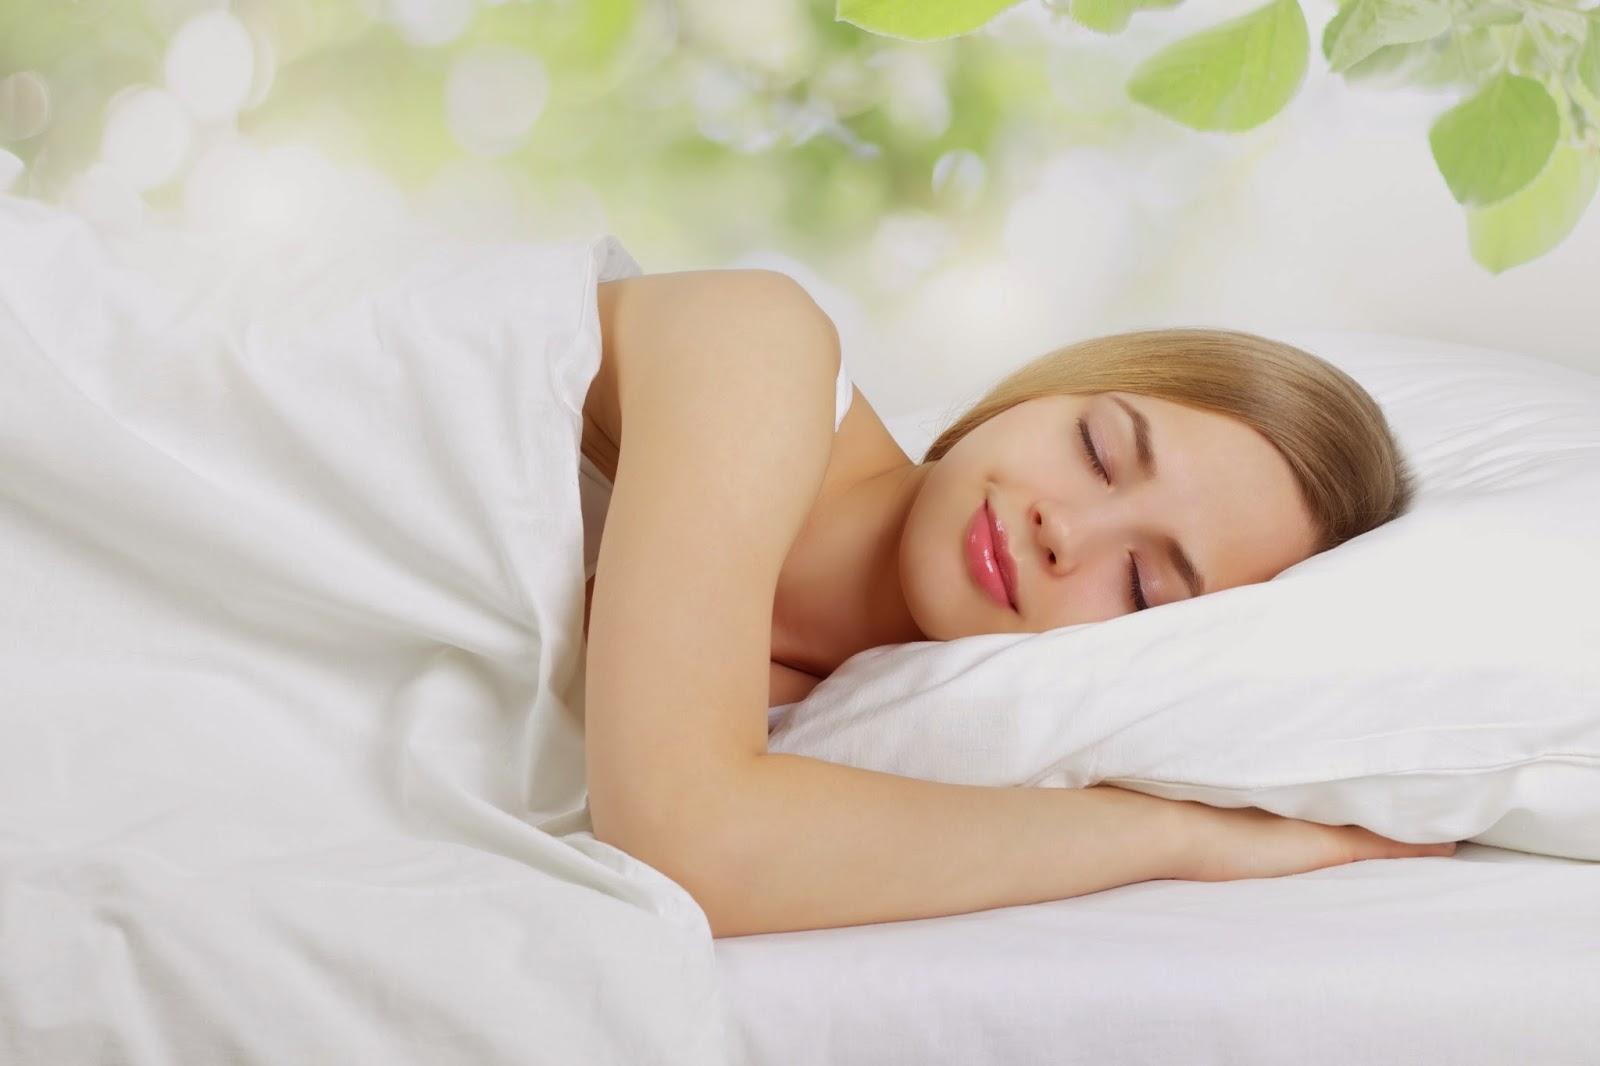 Yoga giúp ngủ ngon, thư giãn